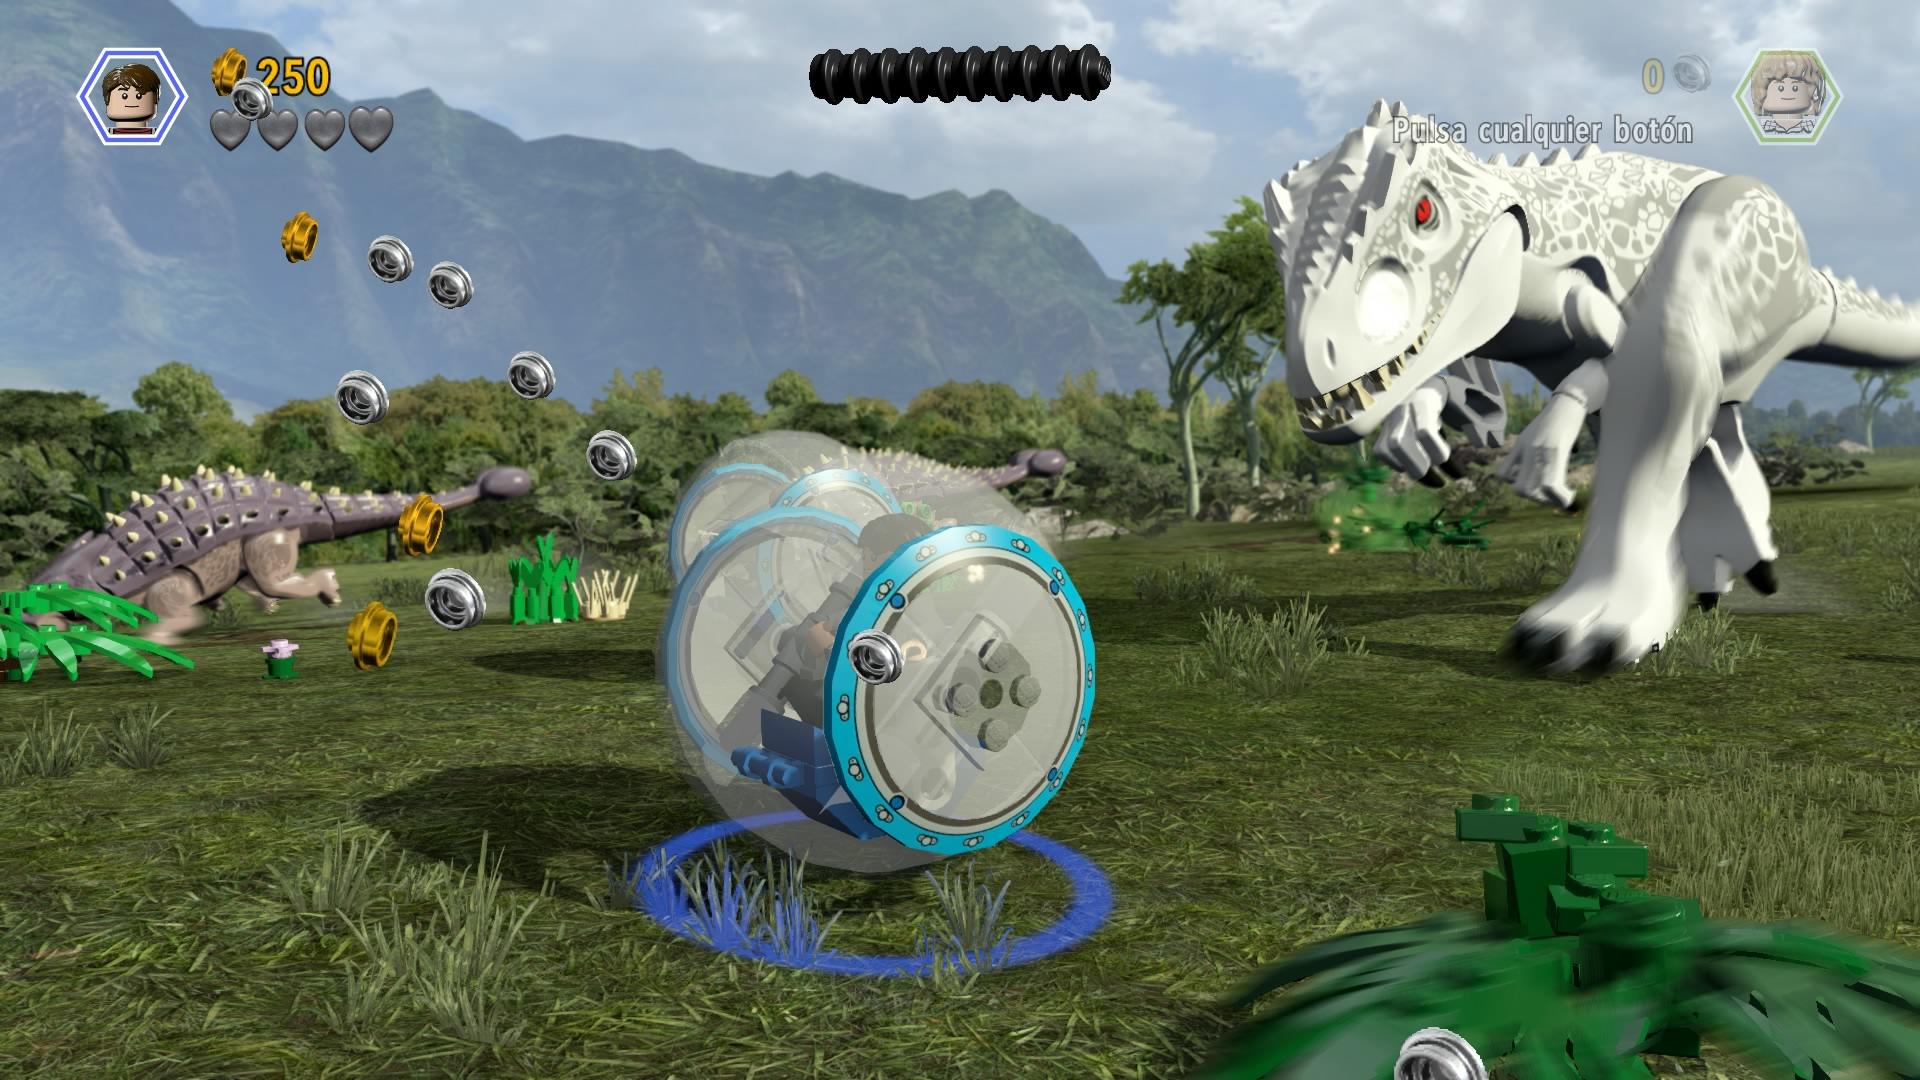 Analisis De Lego Jurassic World Hobbyconsolas Juegos